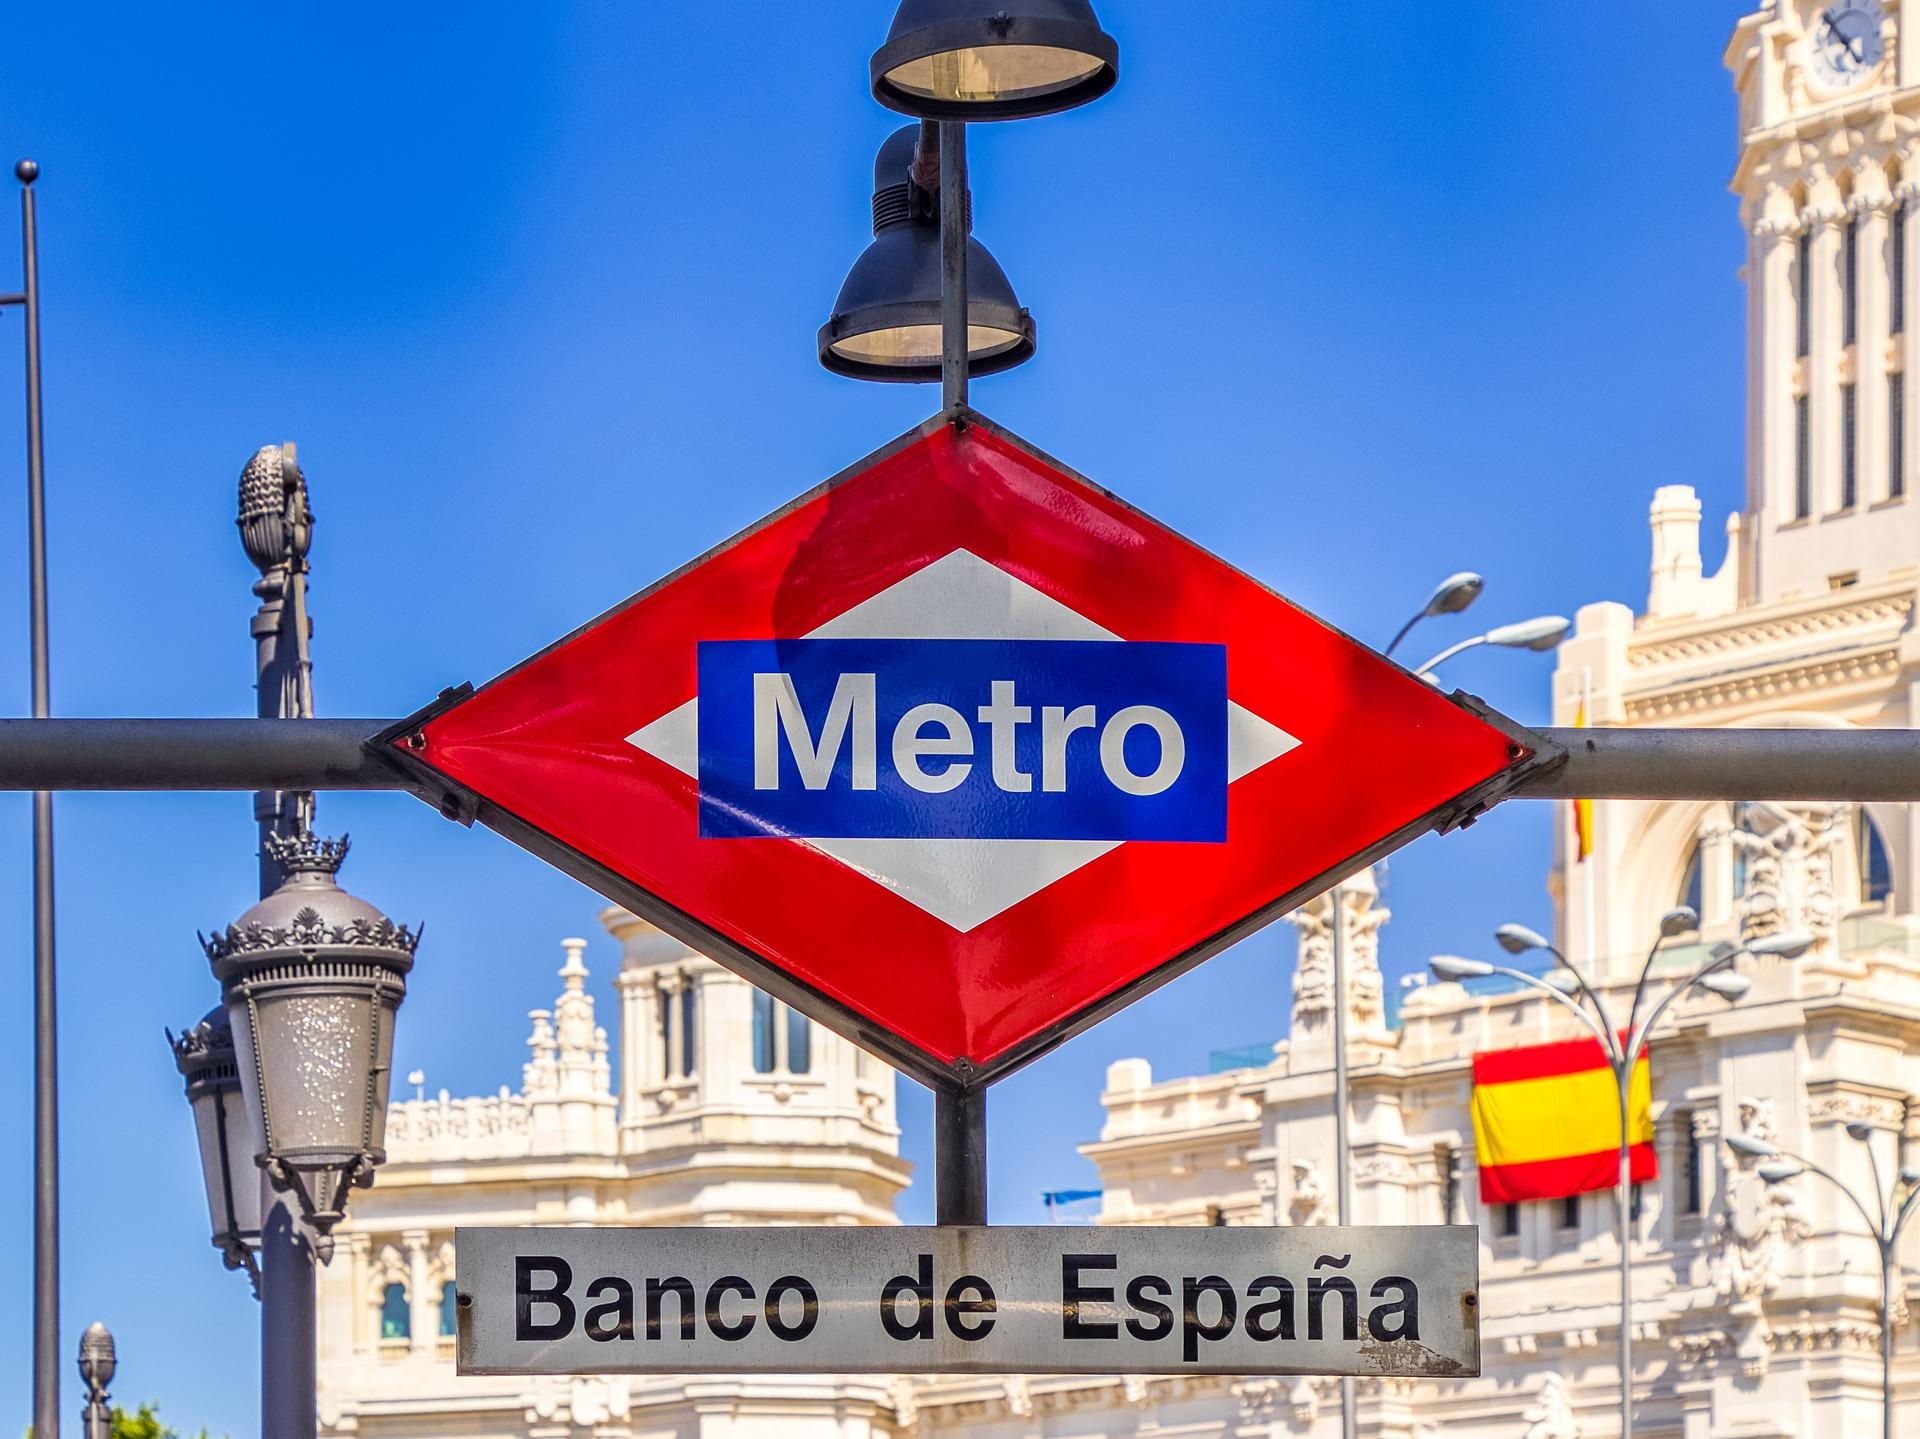 Metro de Madrid Estación Banco de España